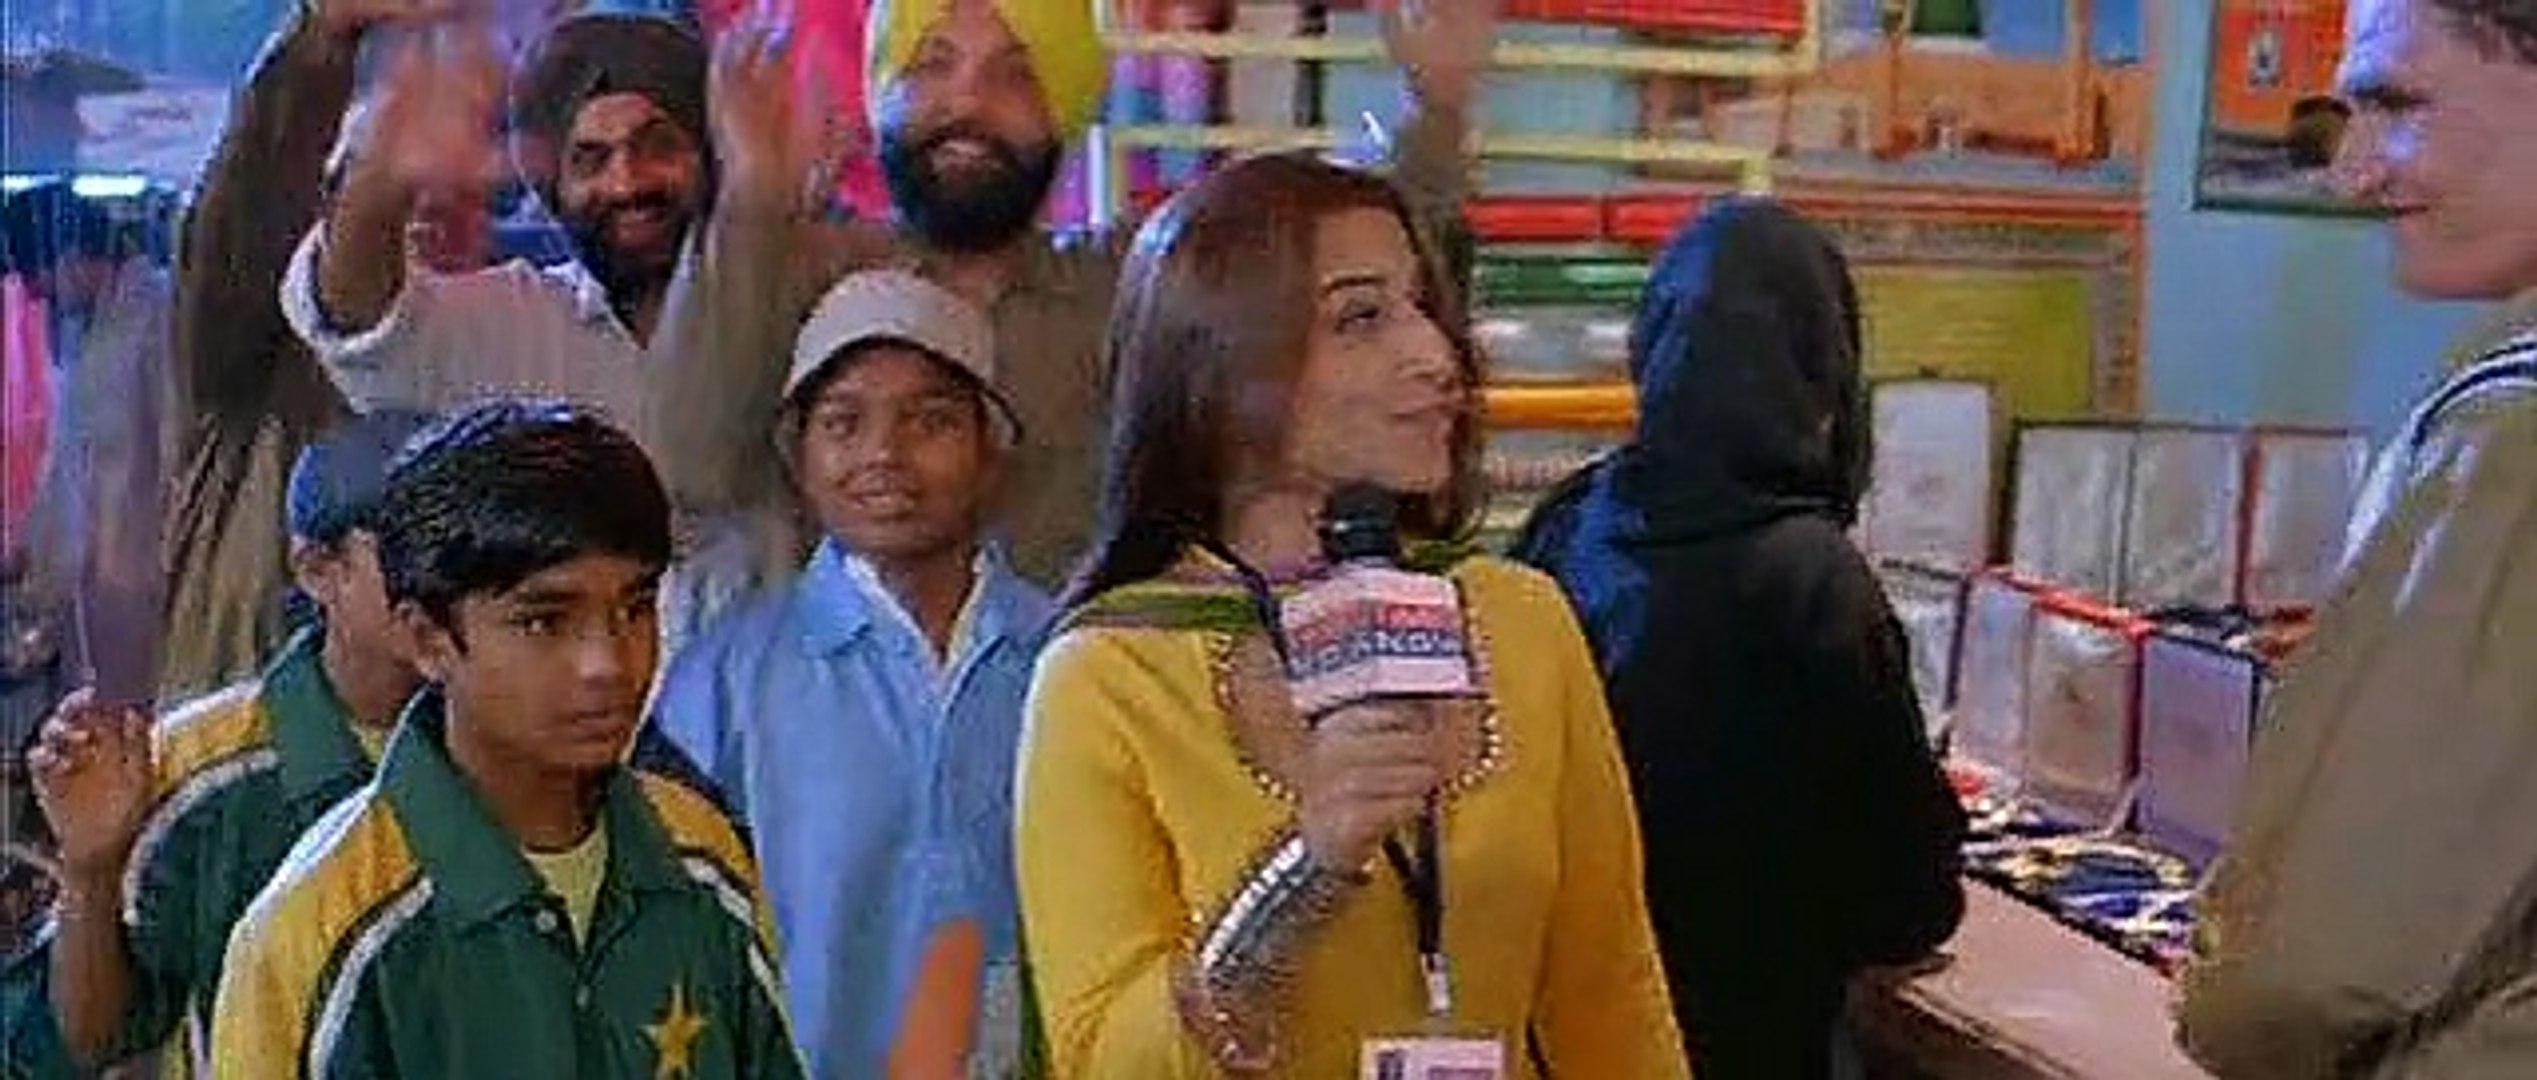 Salaam E Ishq 2007 Full Hindi Movie Part 3 Salaam E Ishq 2007 Movie